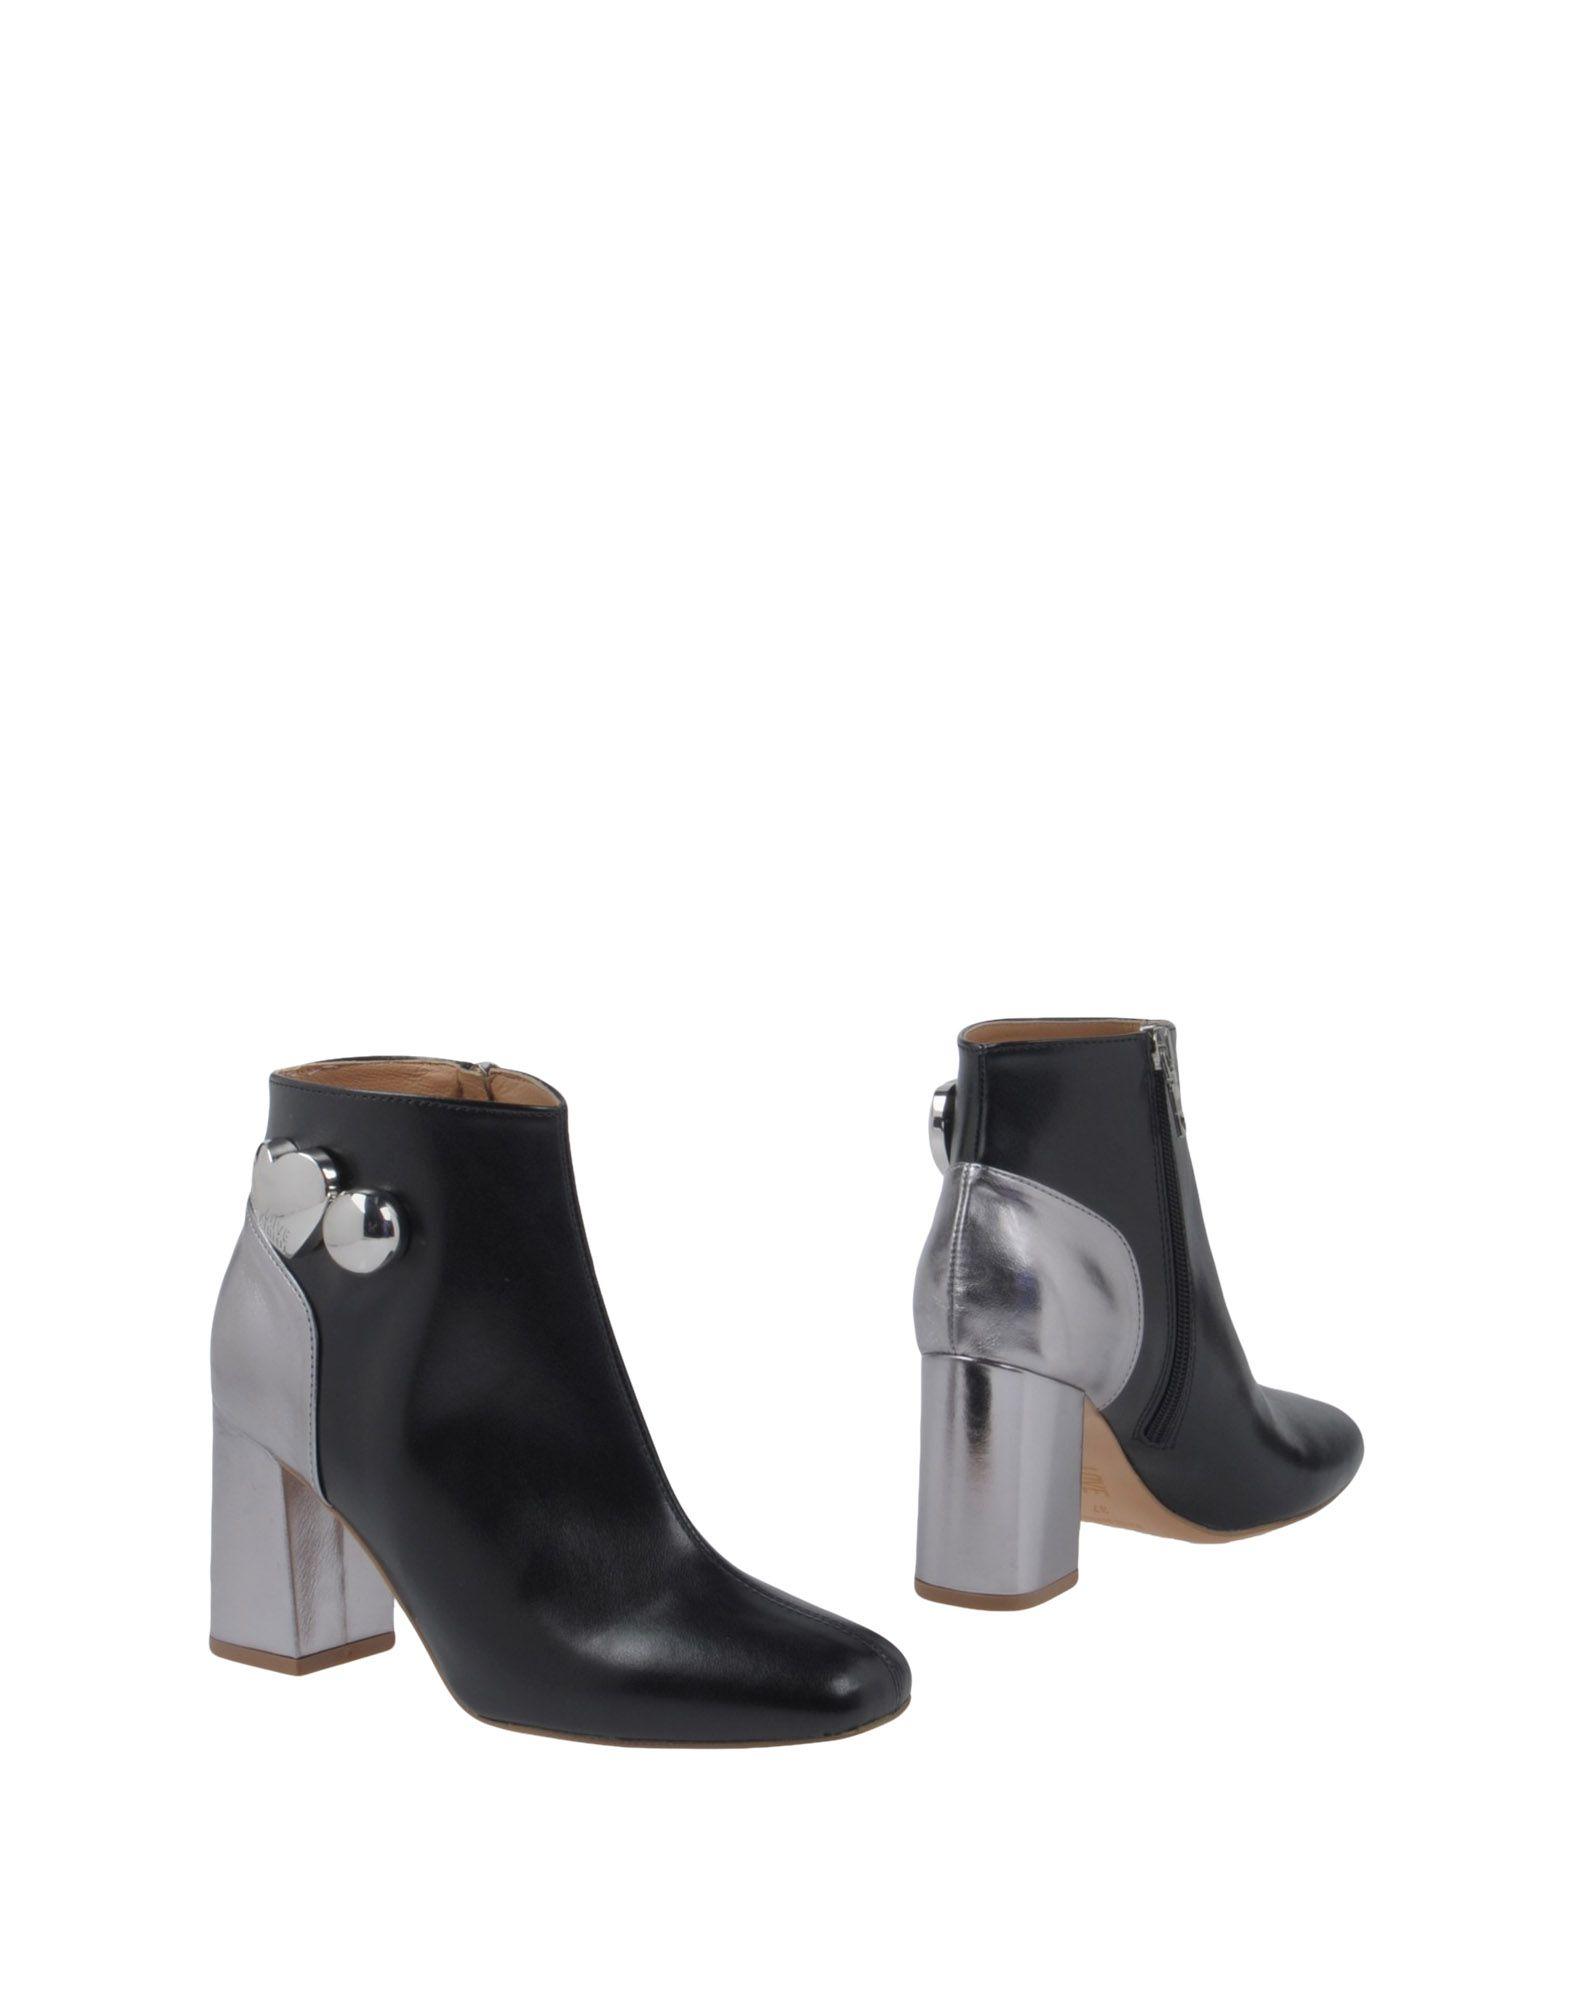 LOVE MOSCHINO Полусапоги и высокие ботинки george j love полусапоги и высокие ботинки